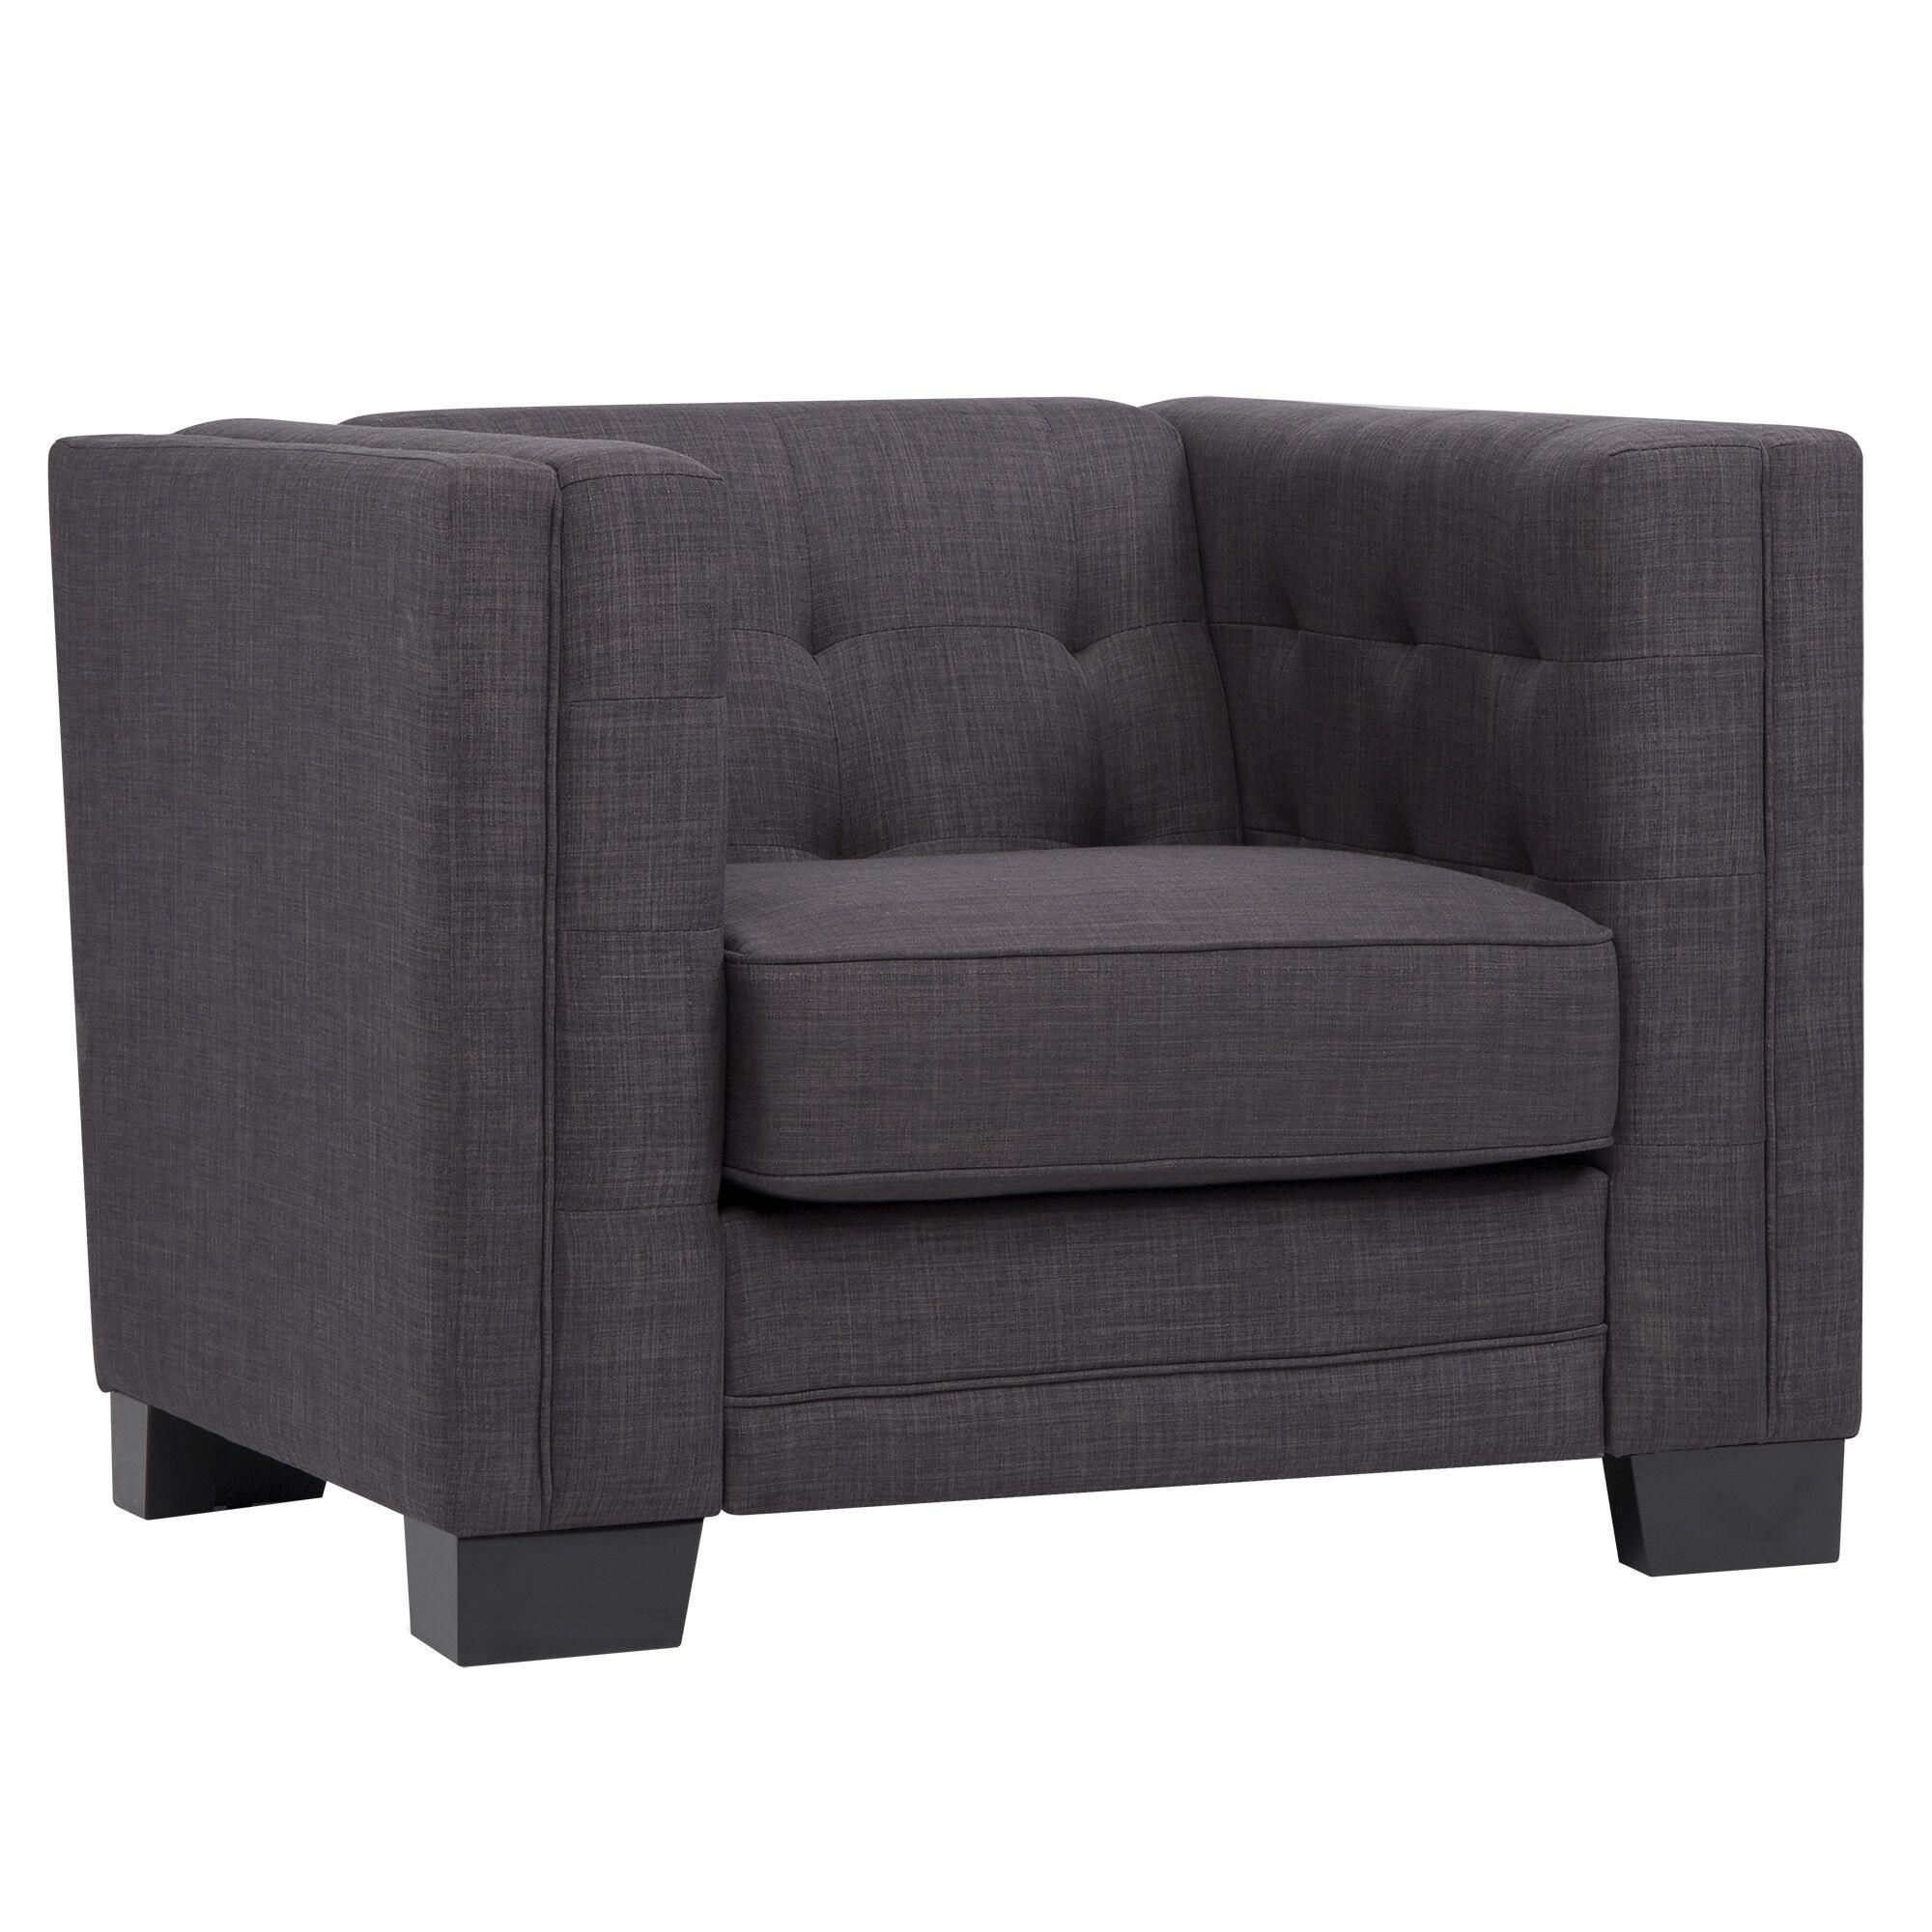 Vidette Square Lounge Chair Upholstery: Dark Gray